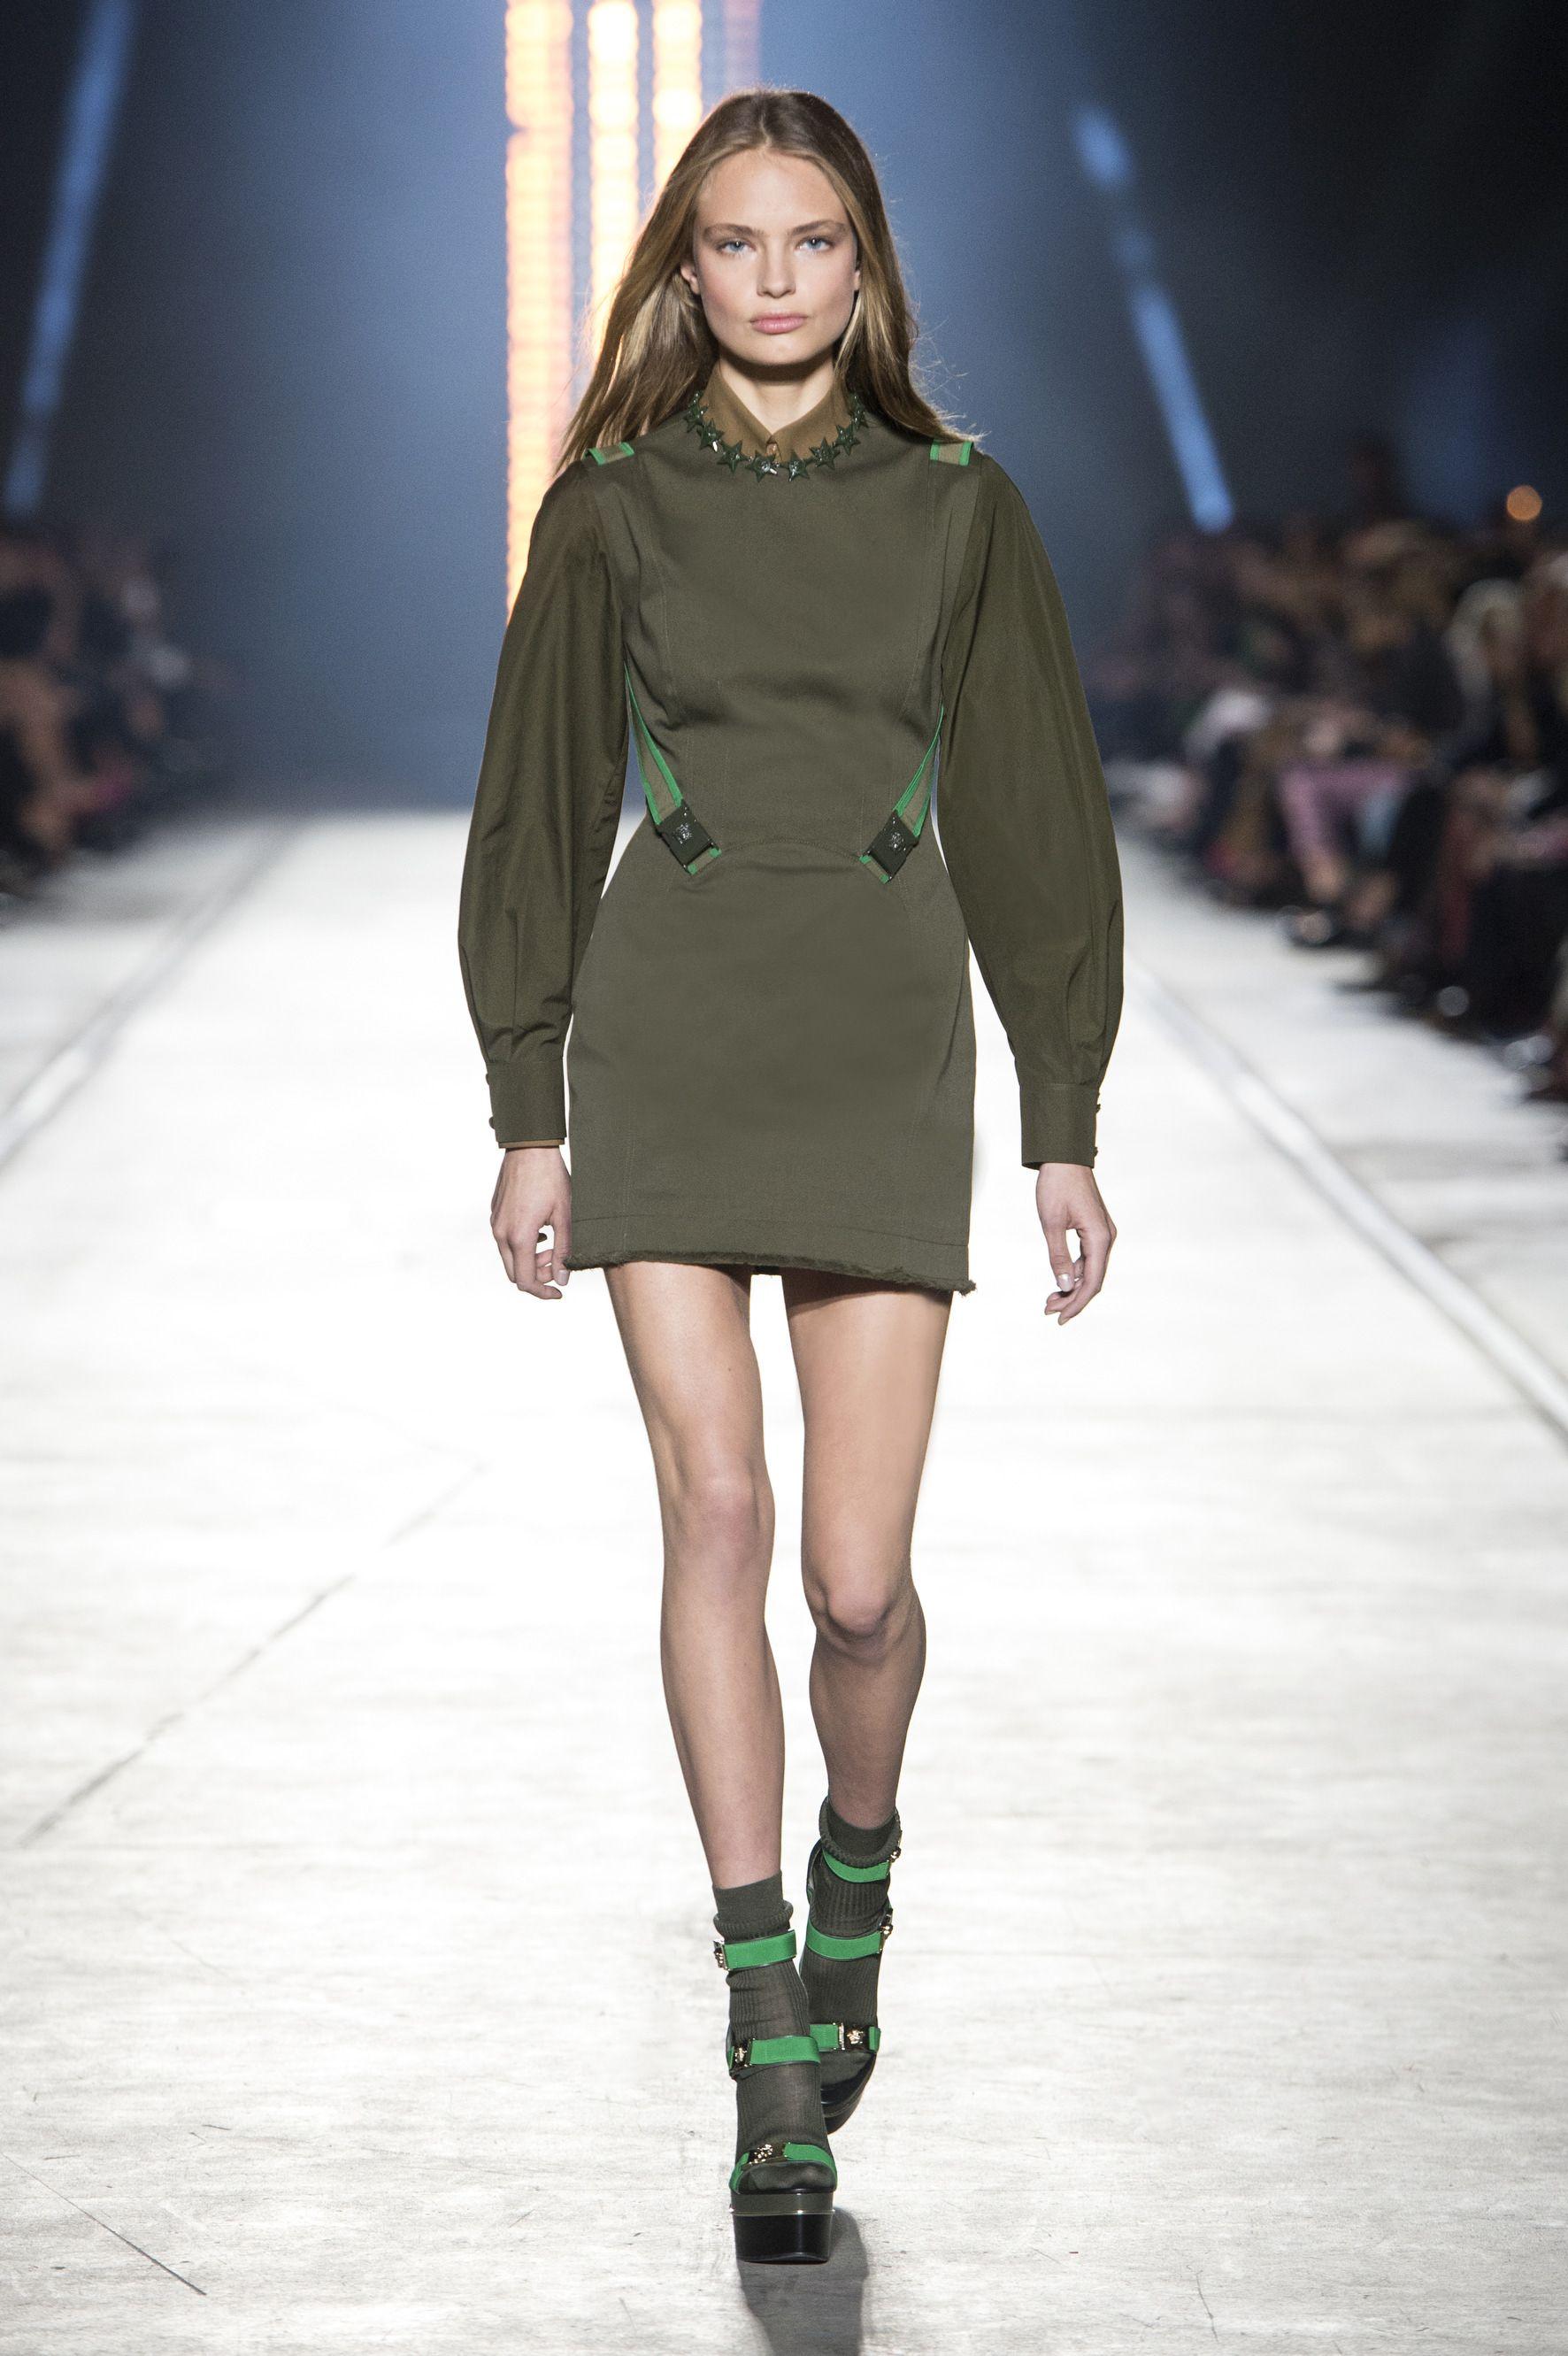 b19d2520619 Pin by Natasa Ribic on Military fashion | Fashion, Versace, Womens ...